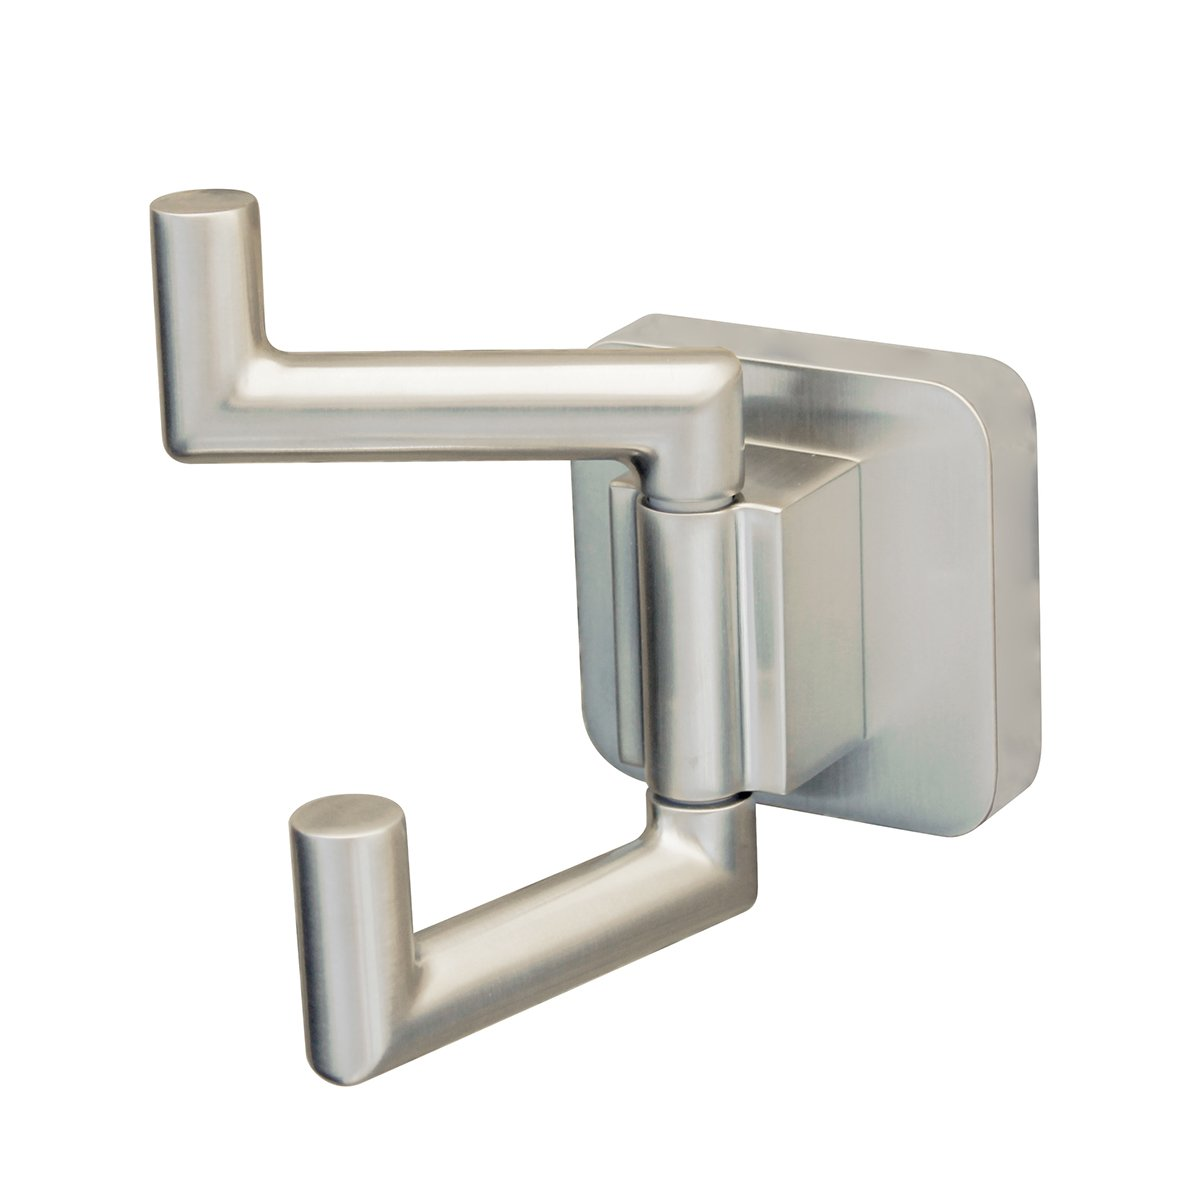 Speakman SA-2405-BN Kubos Toilet Paper Holder Brushed Nickel